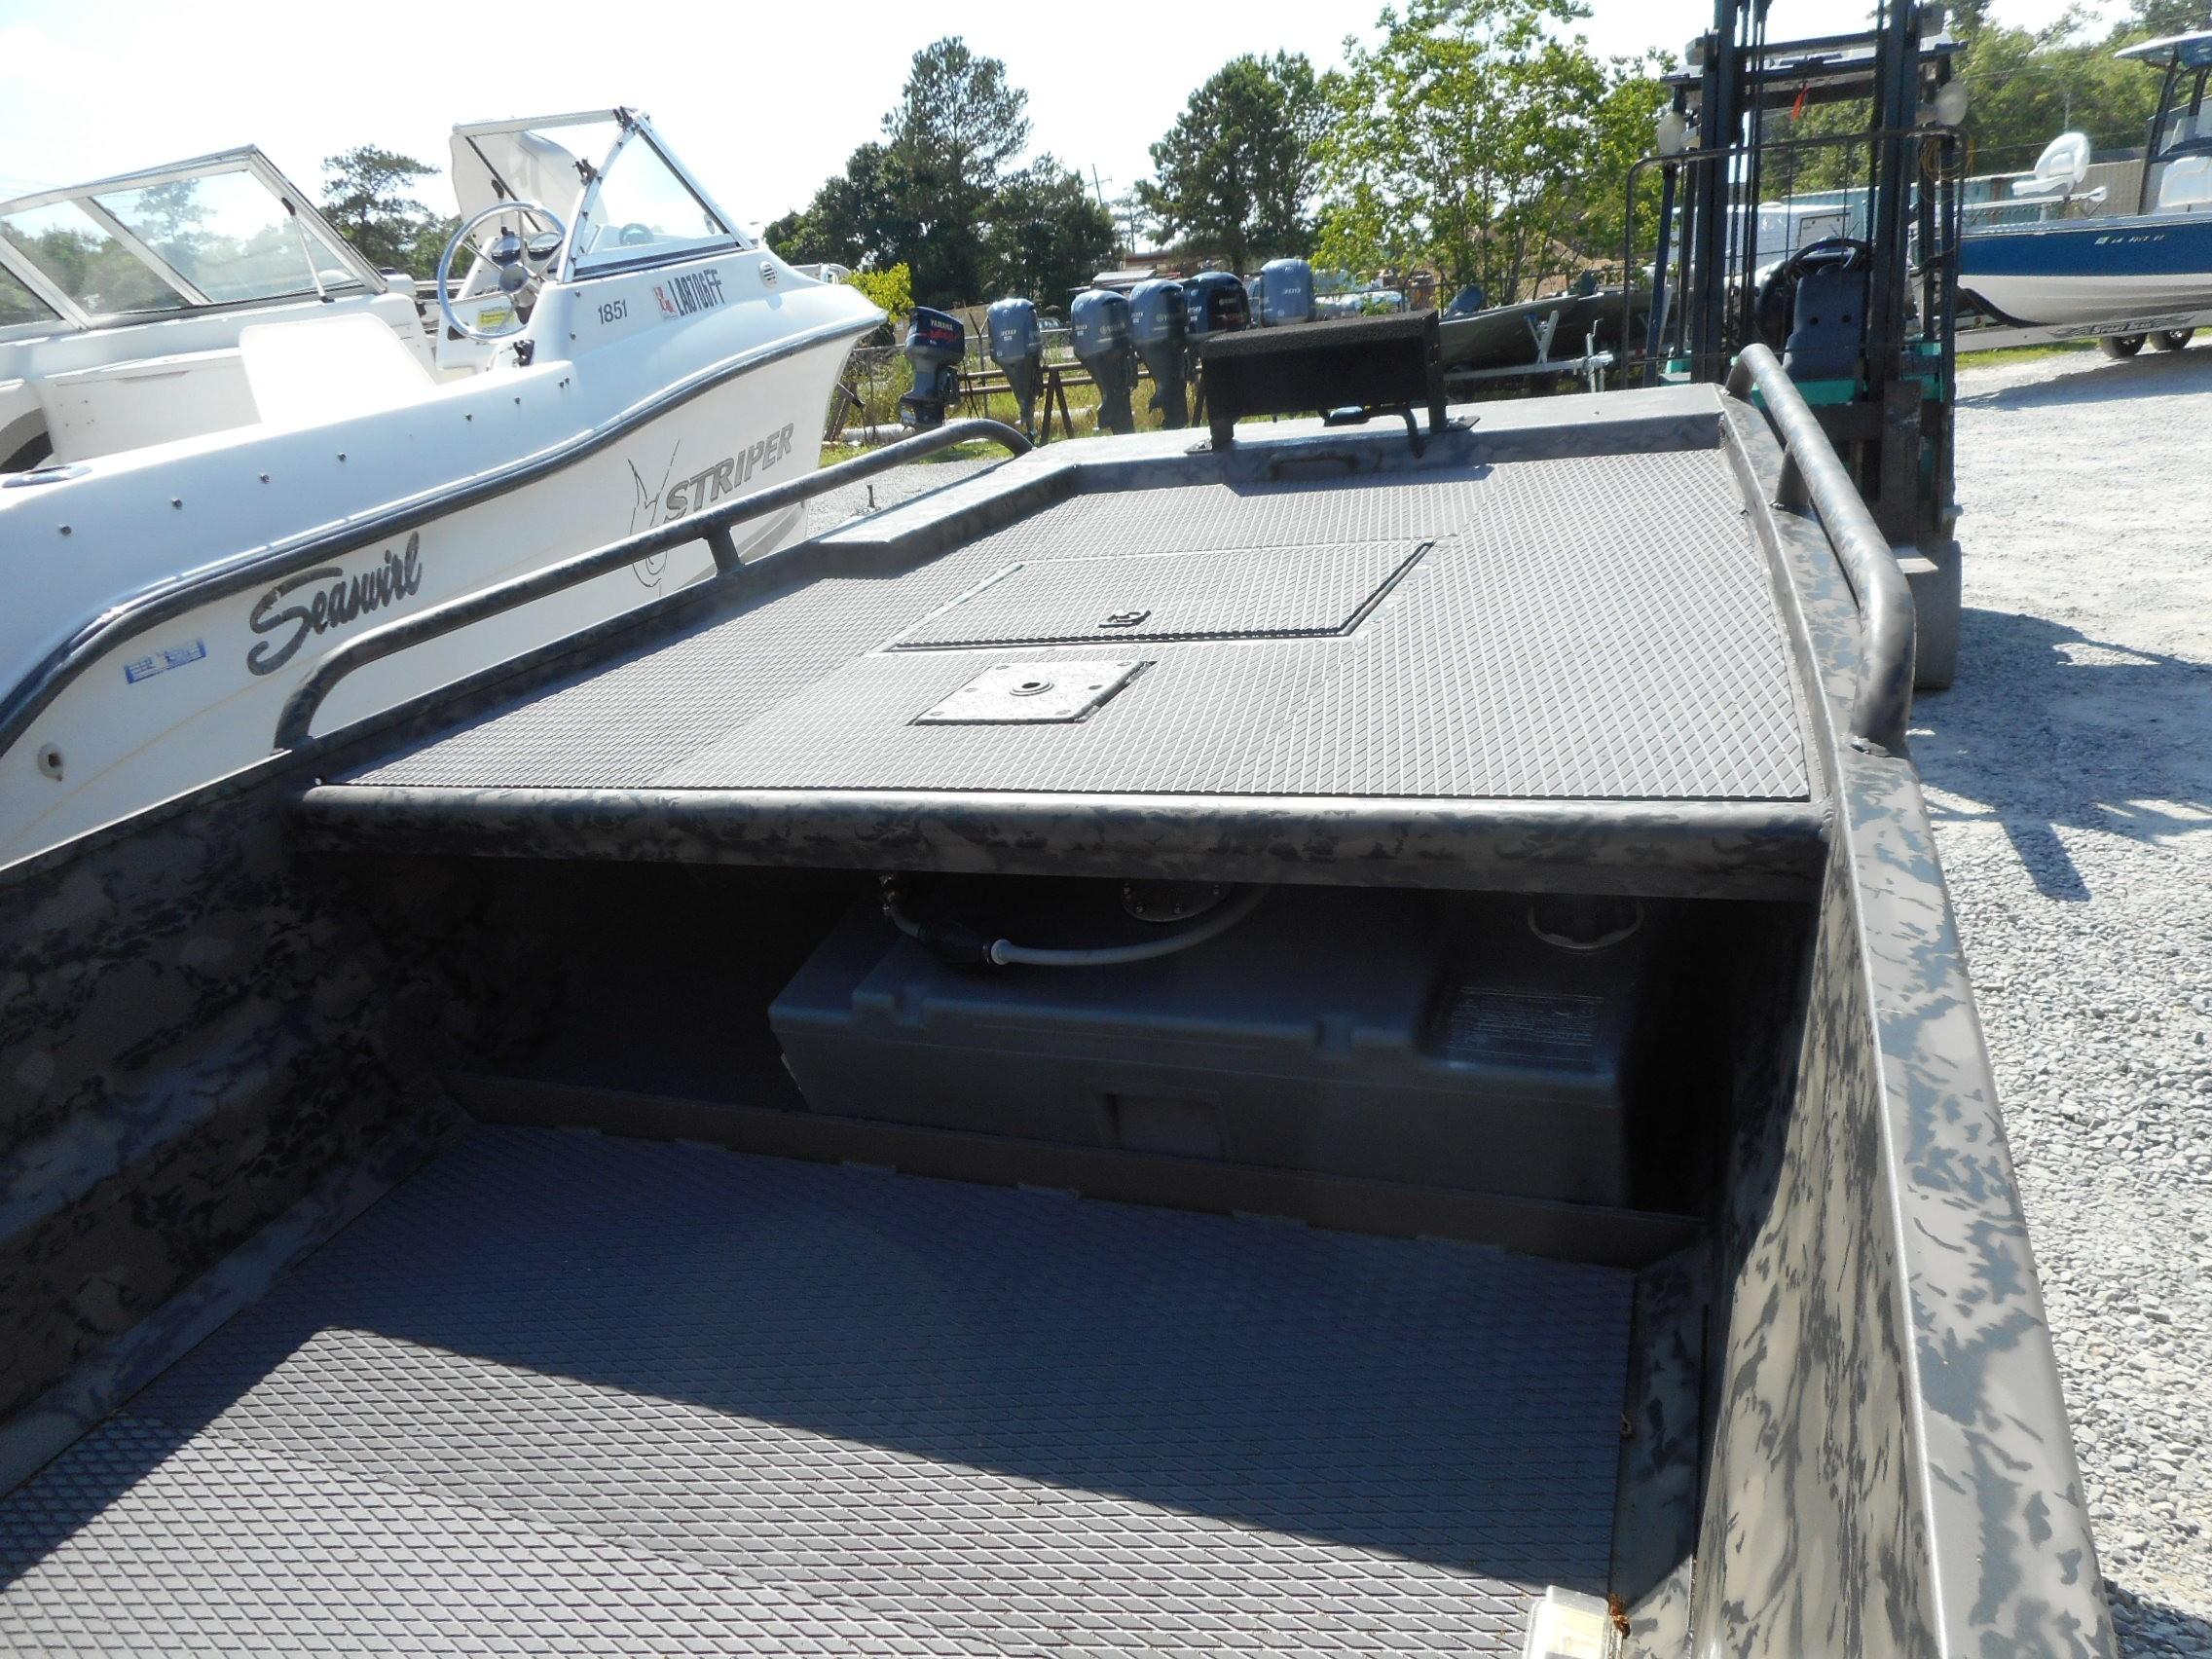 New  2019 17' Gator Tail 1754 CC Aluminum Fish Boat in Slidell, Louisiana